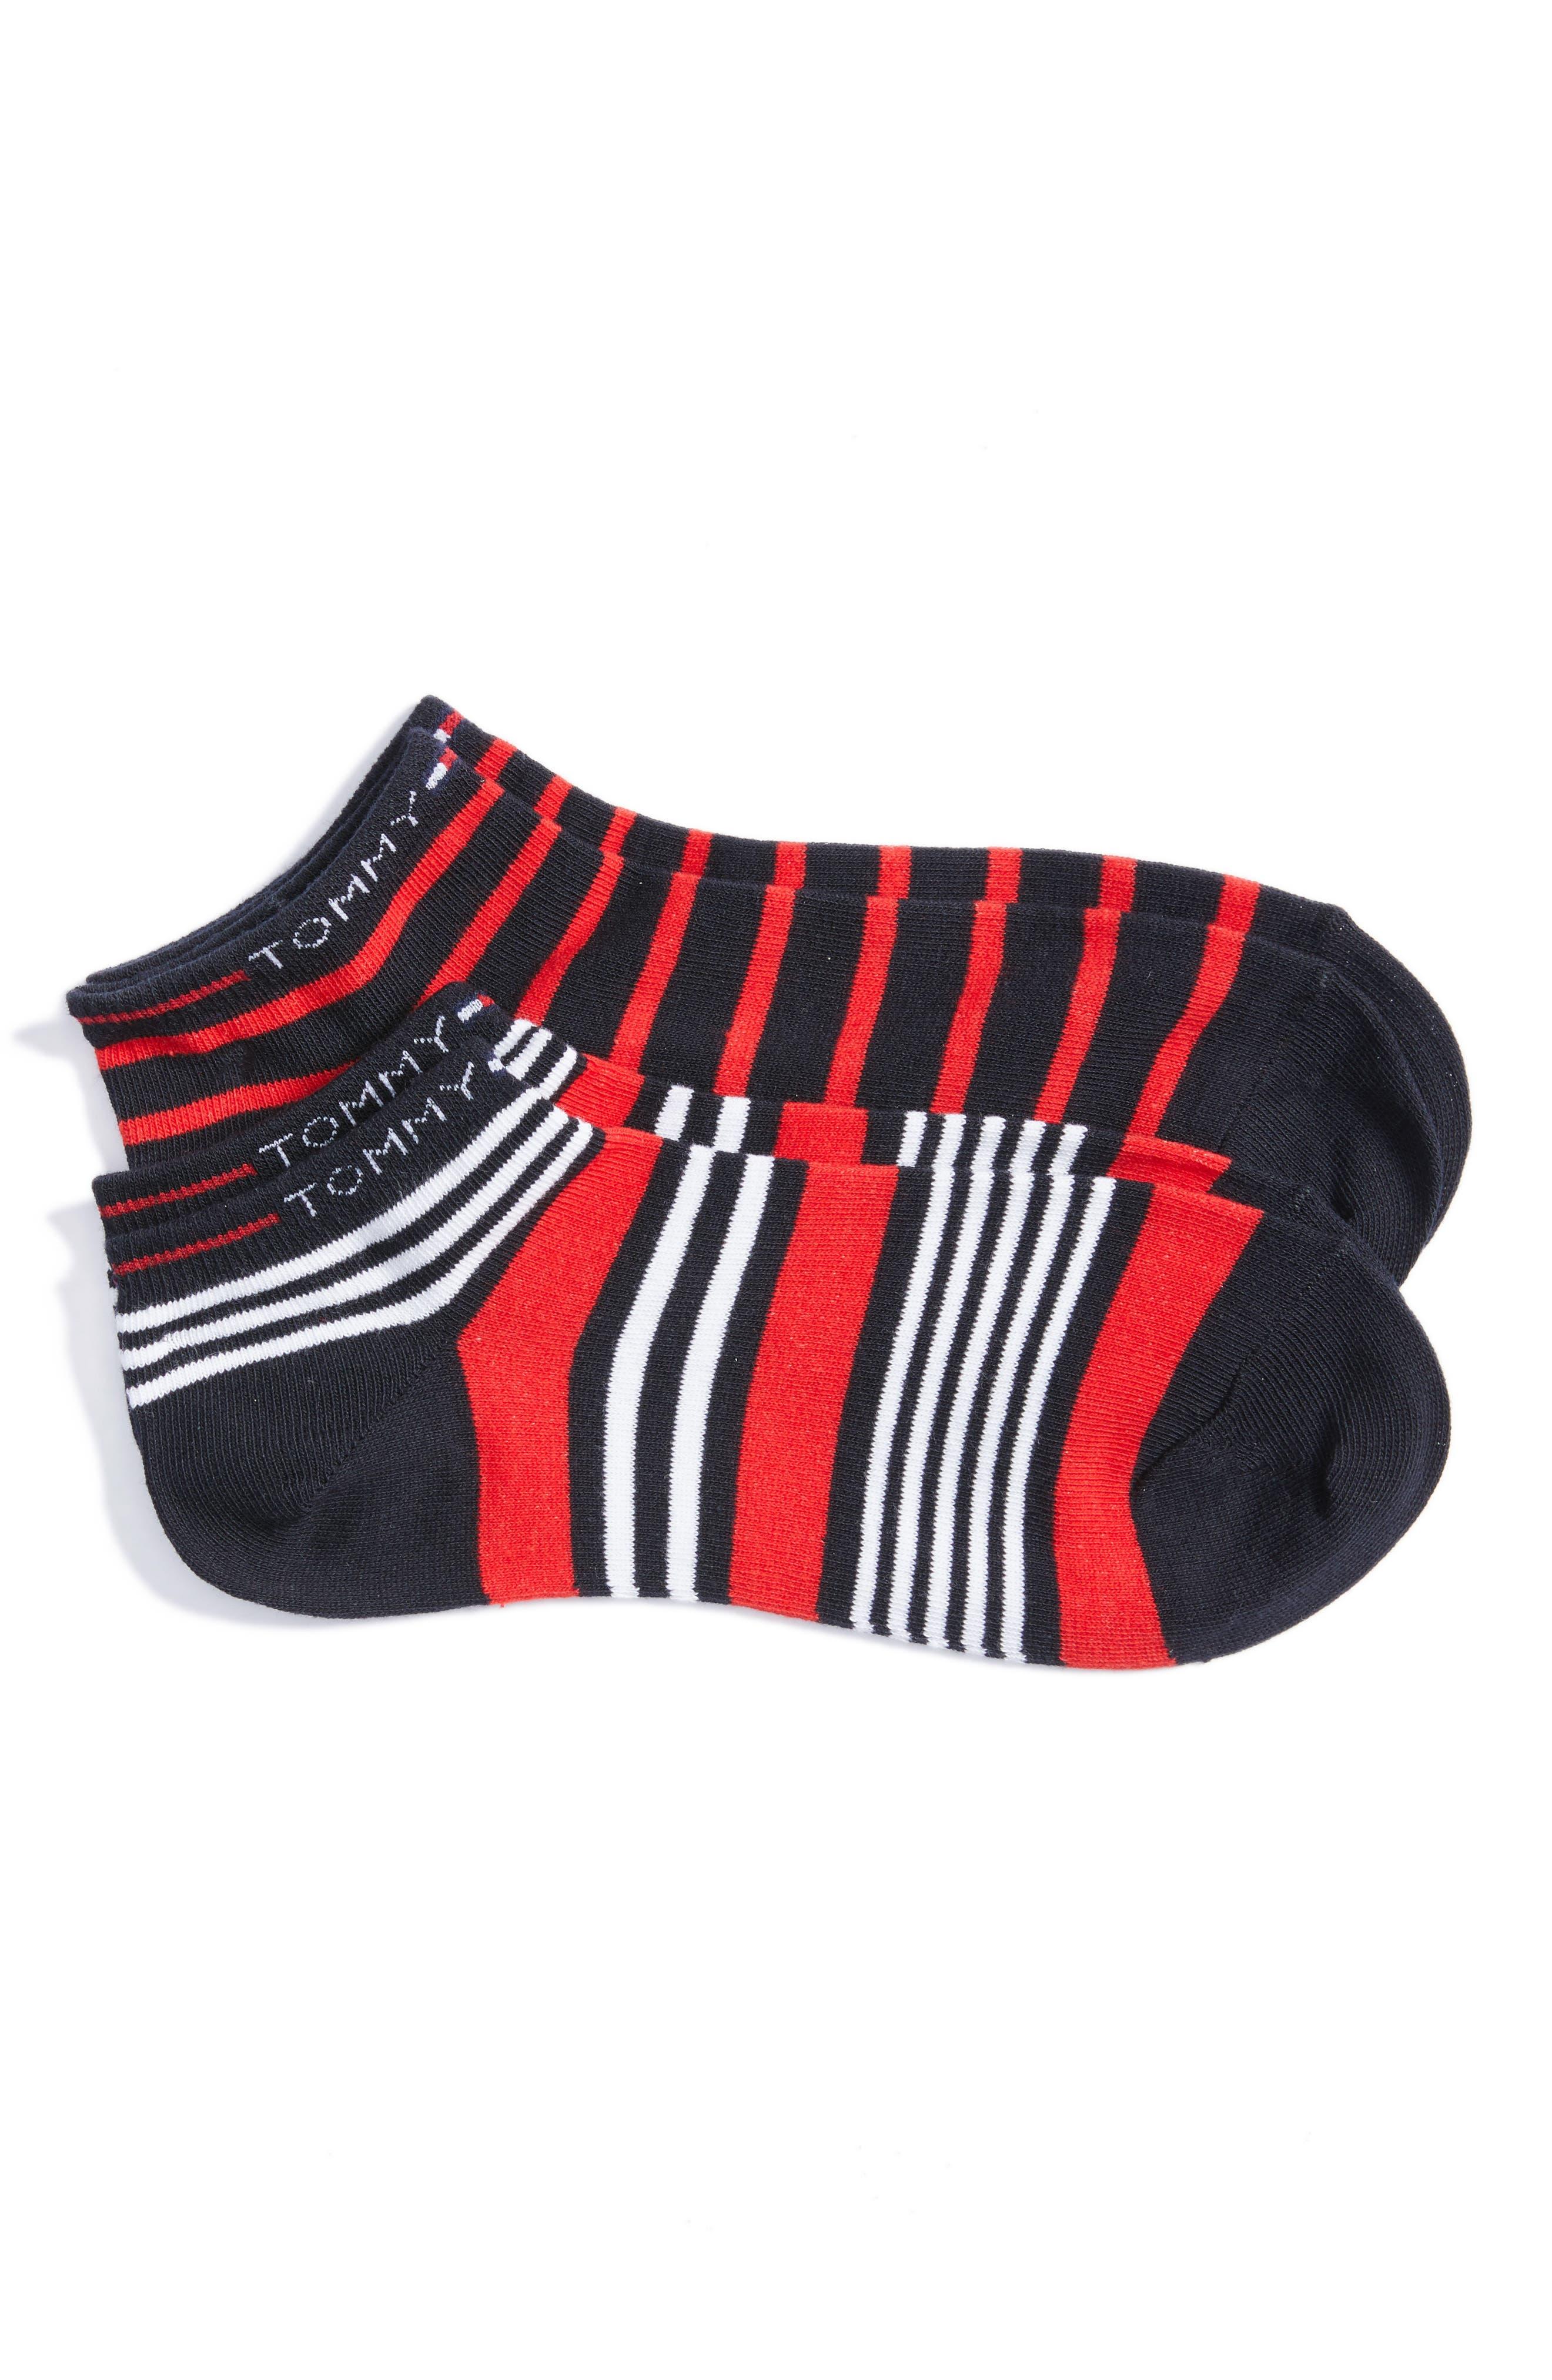 Tommy Hilfiger 2-Pack Stripe Low Cut Socks